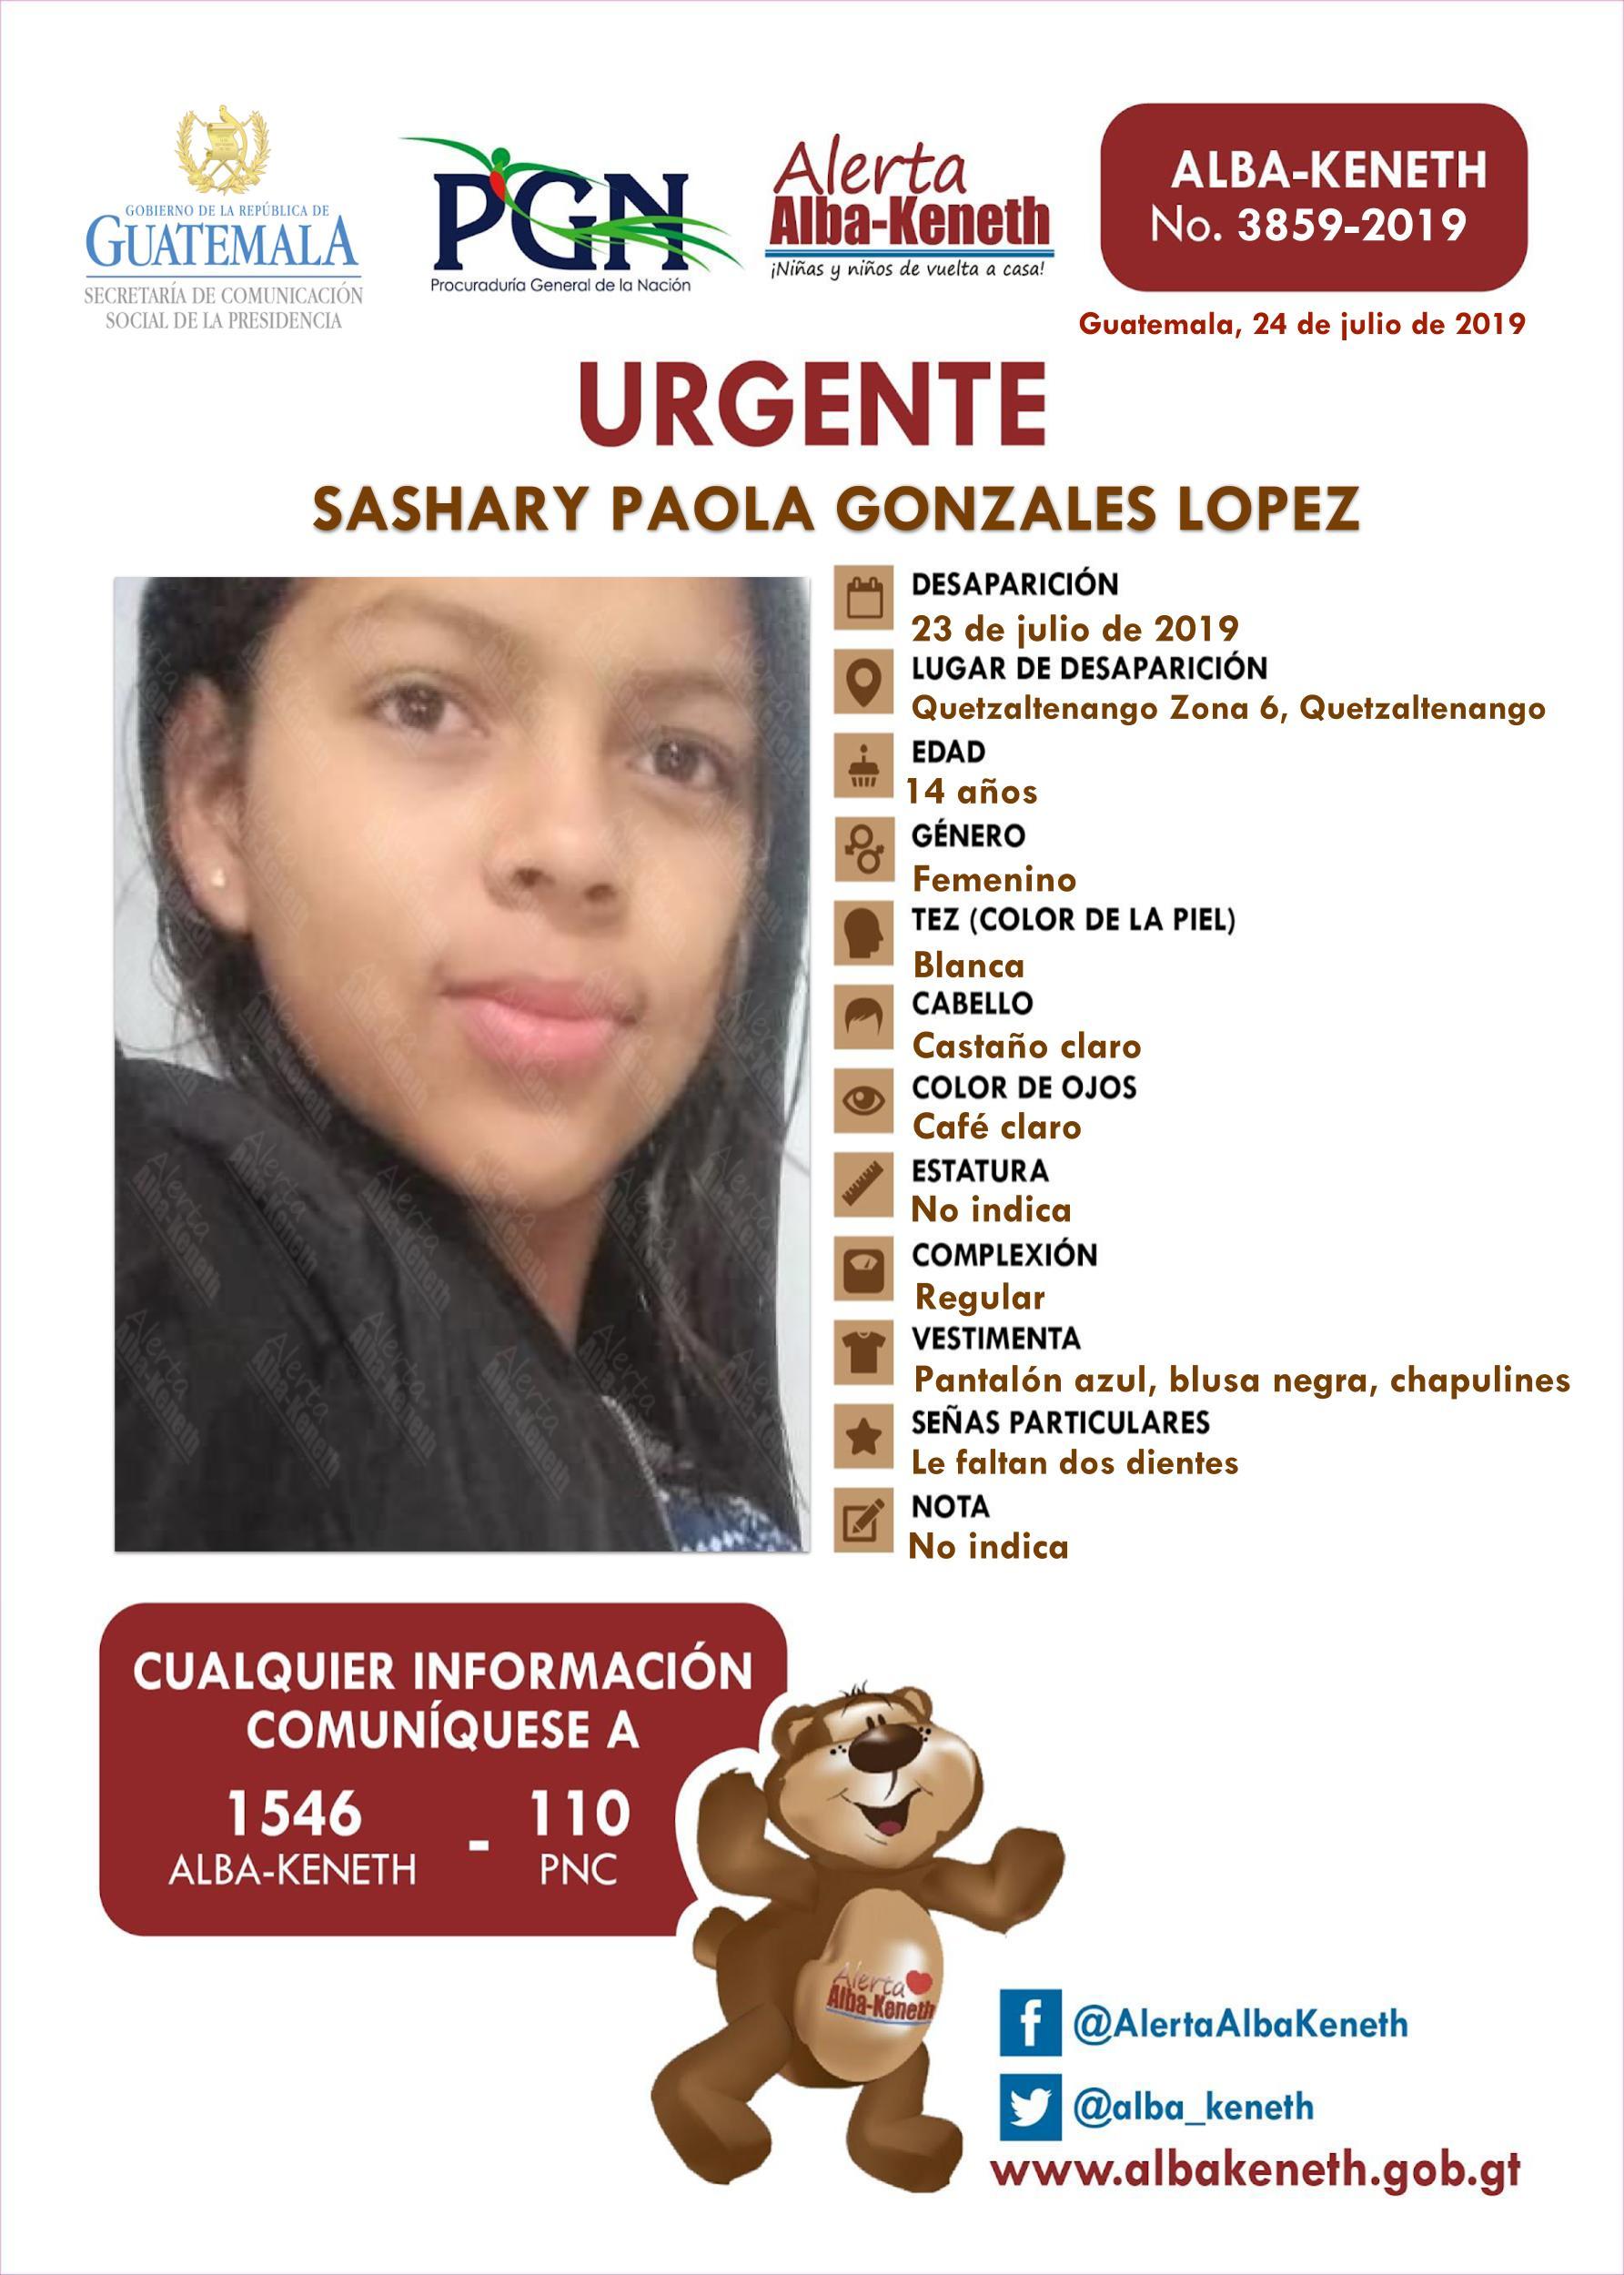 Sashary Paola Gonzales Lopez